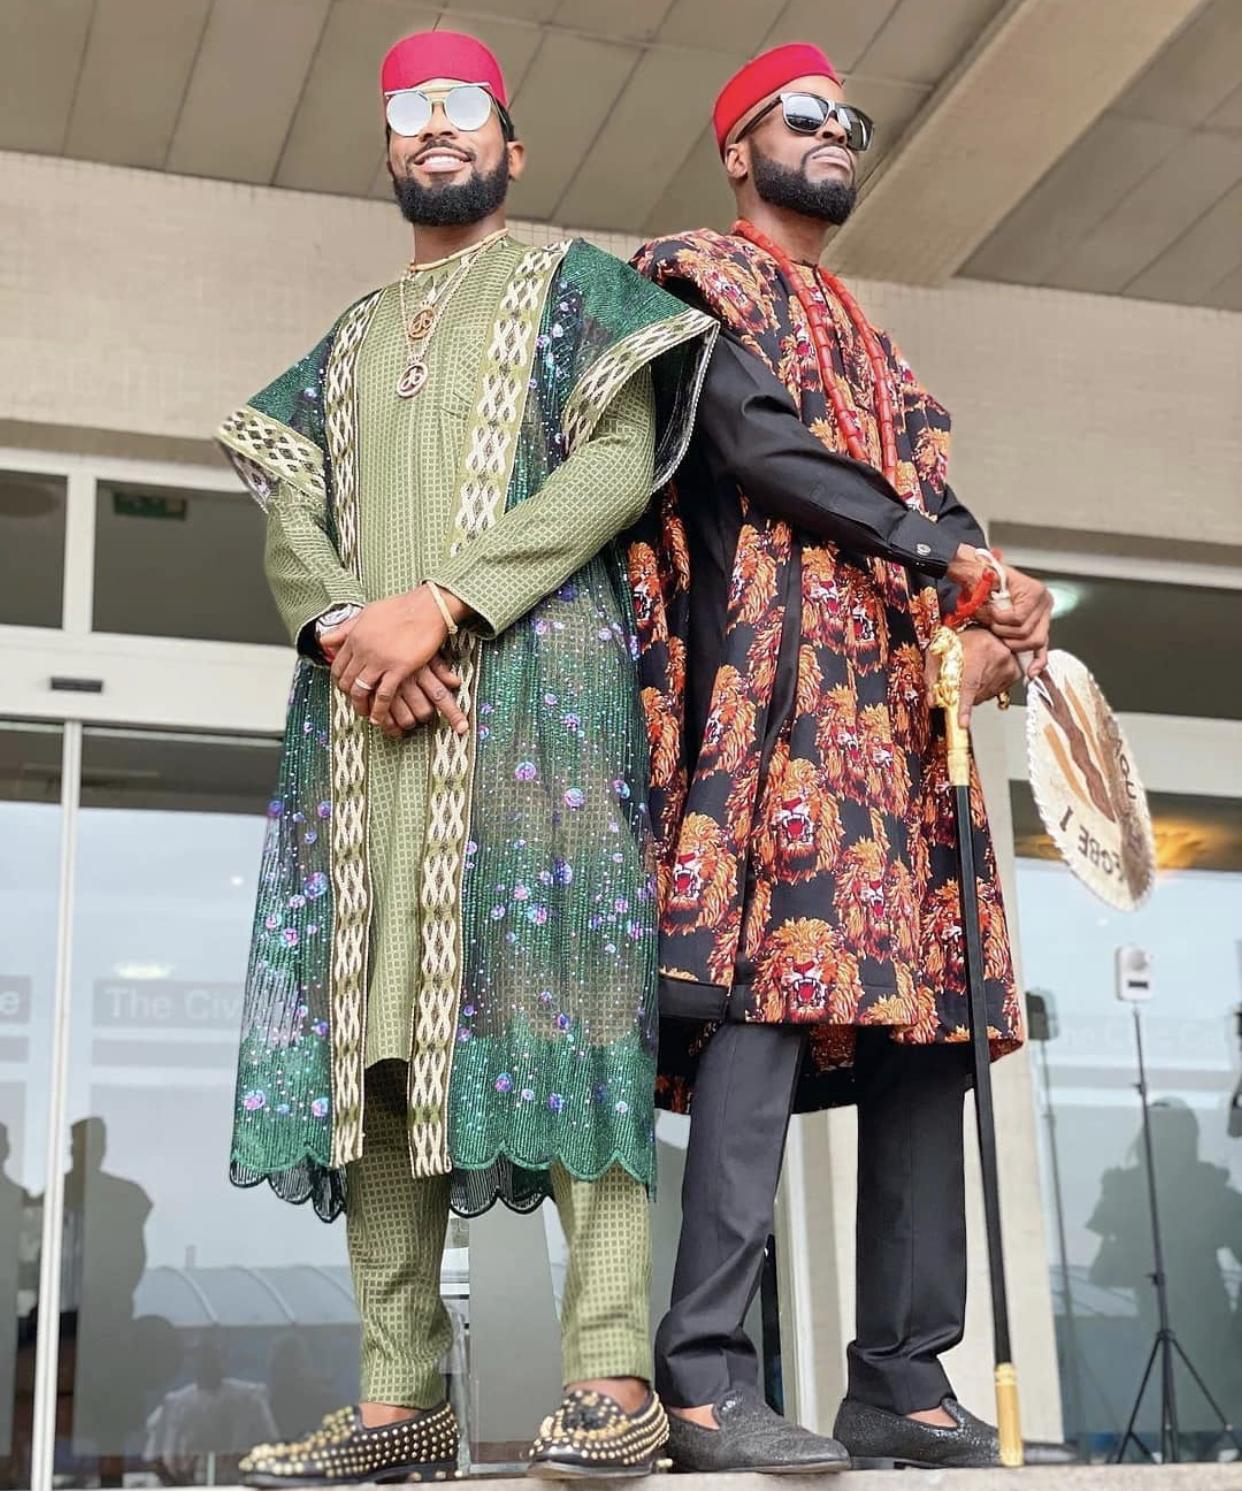 D'banj and Ikechukwu